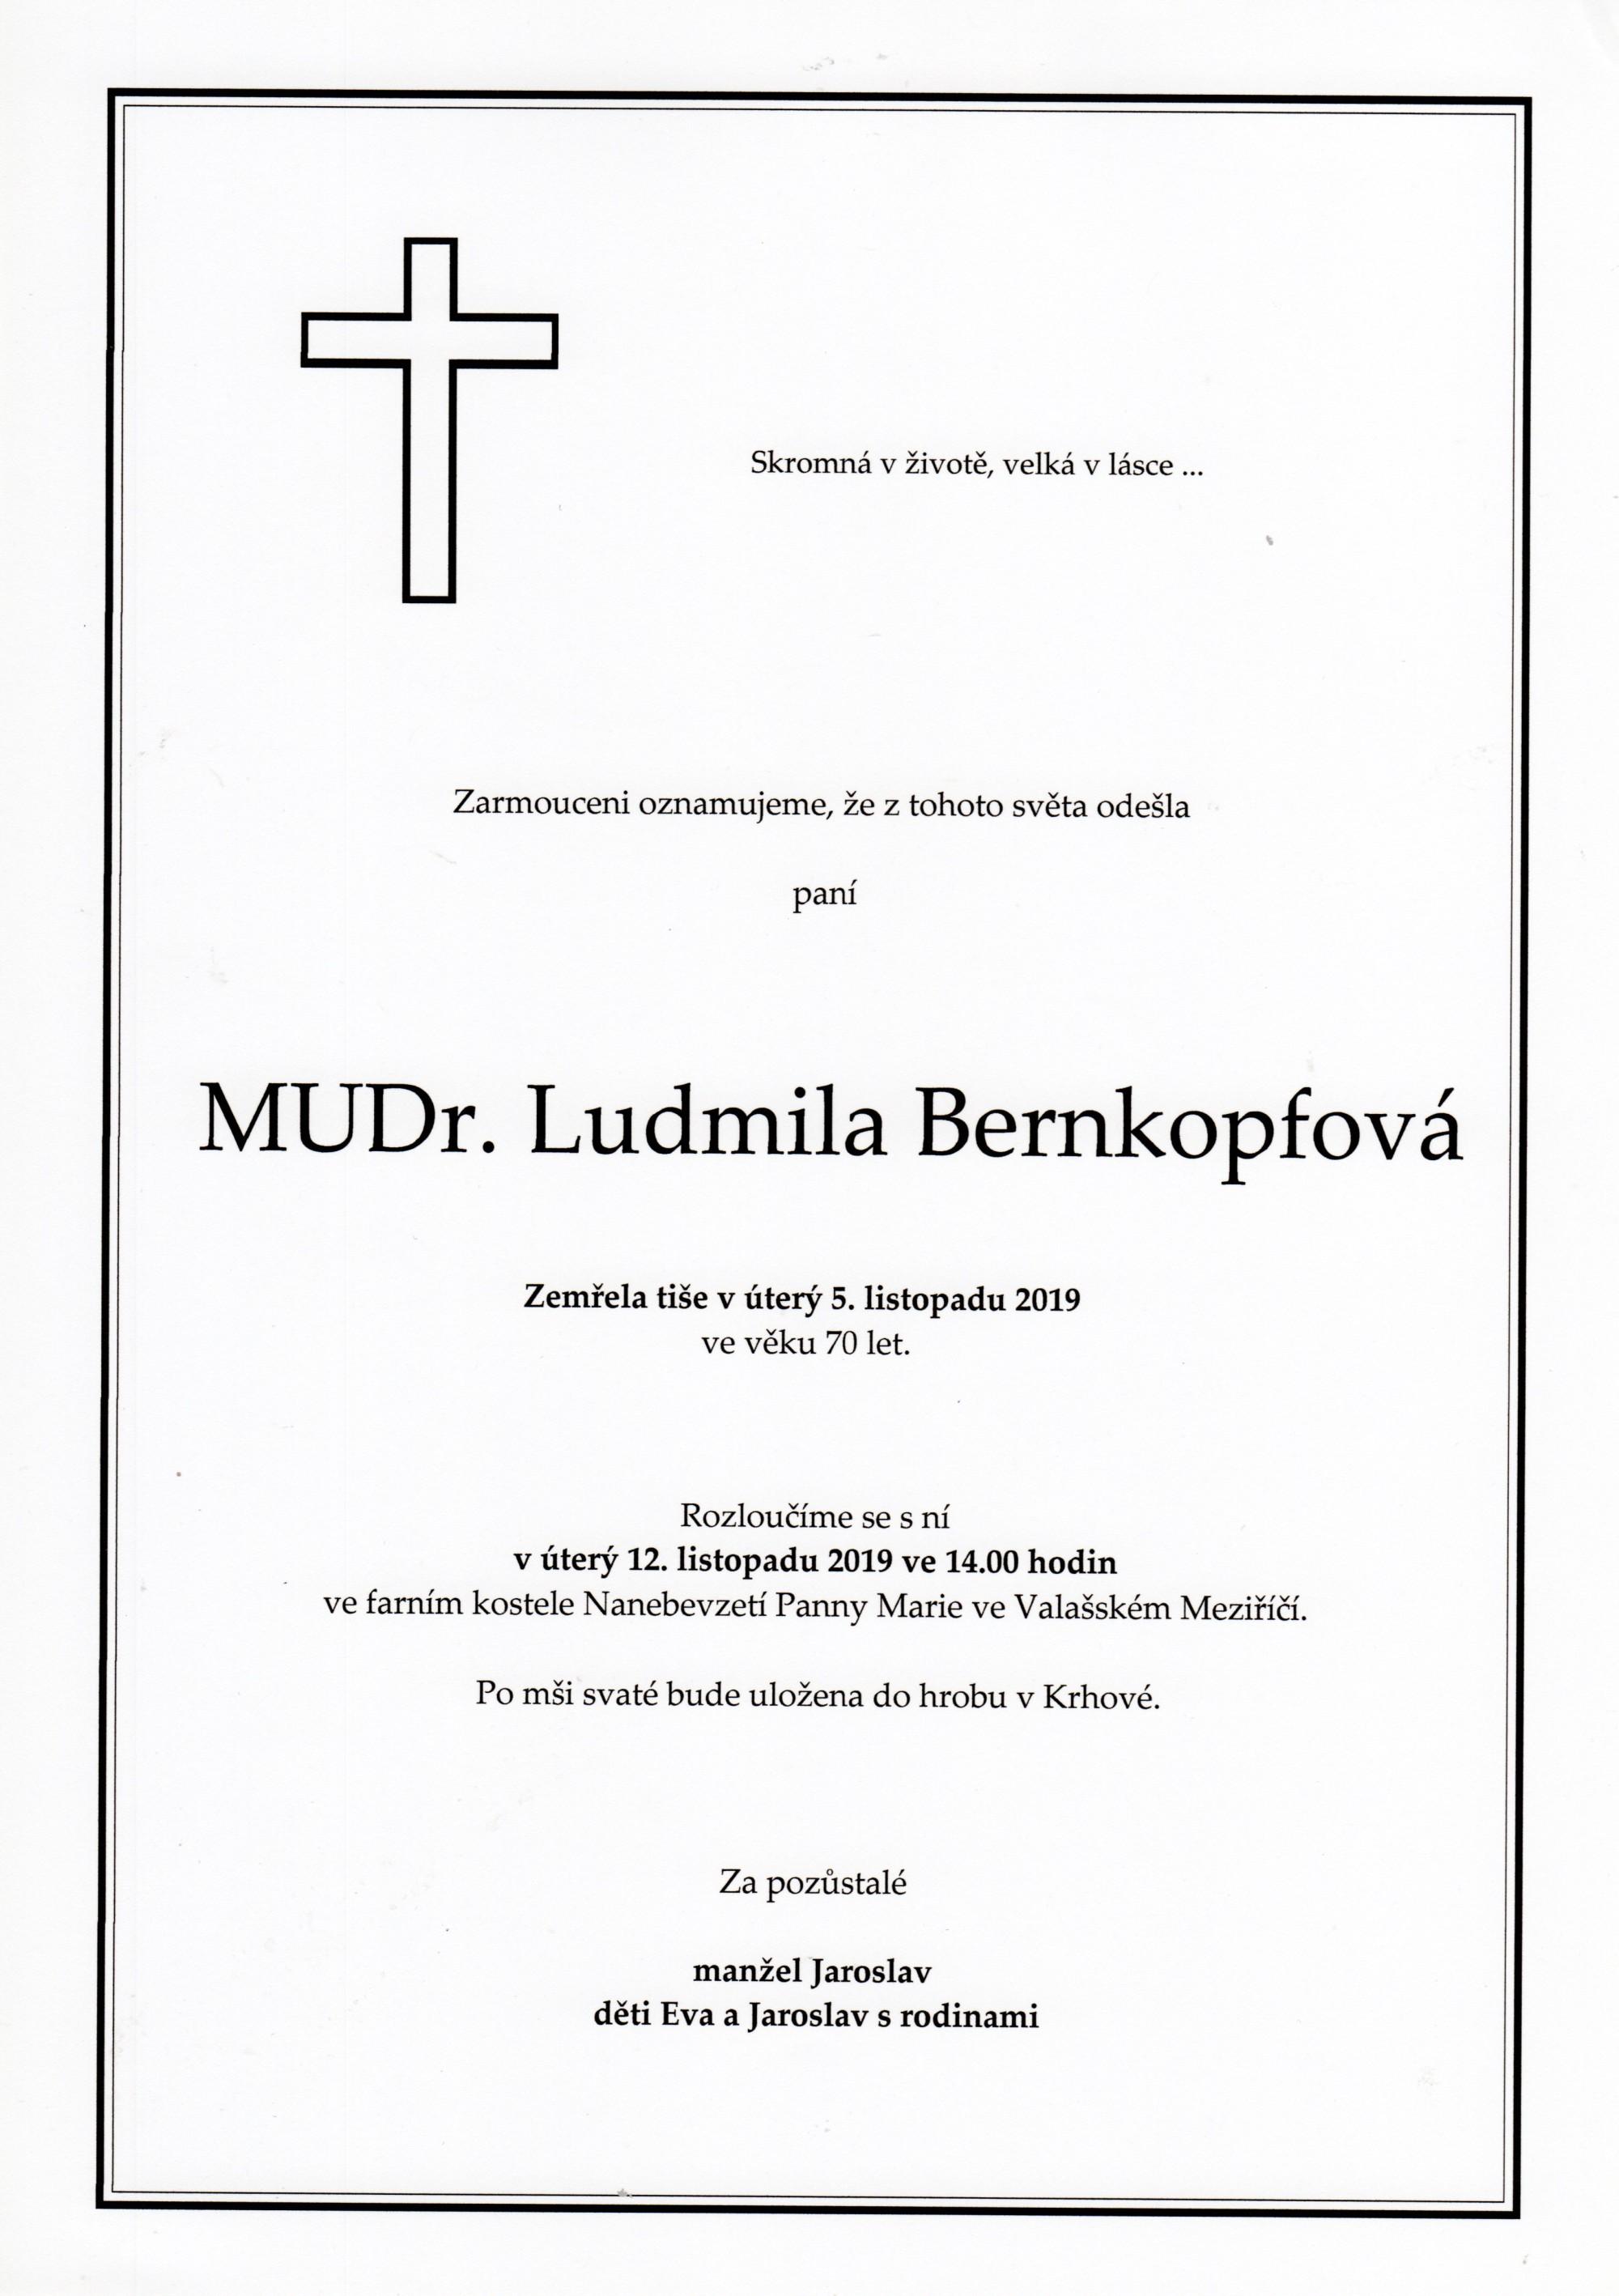 MUDr. Ludmila Bernkopfová